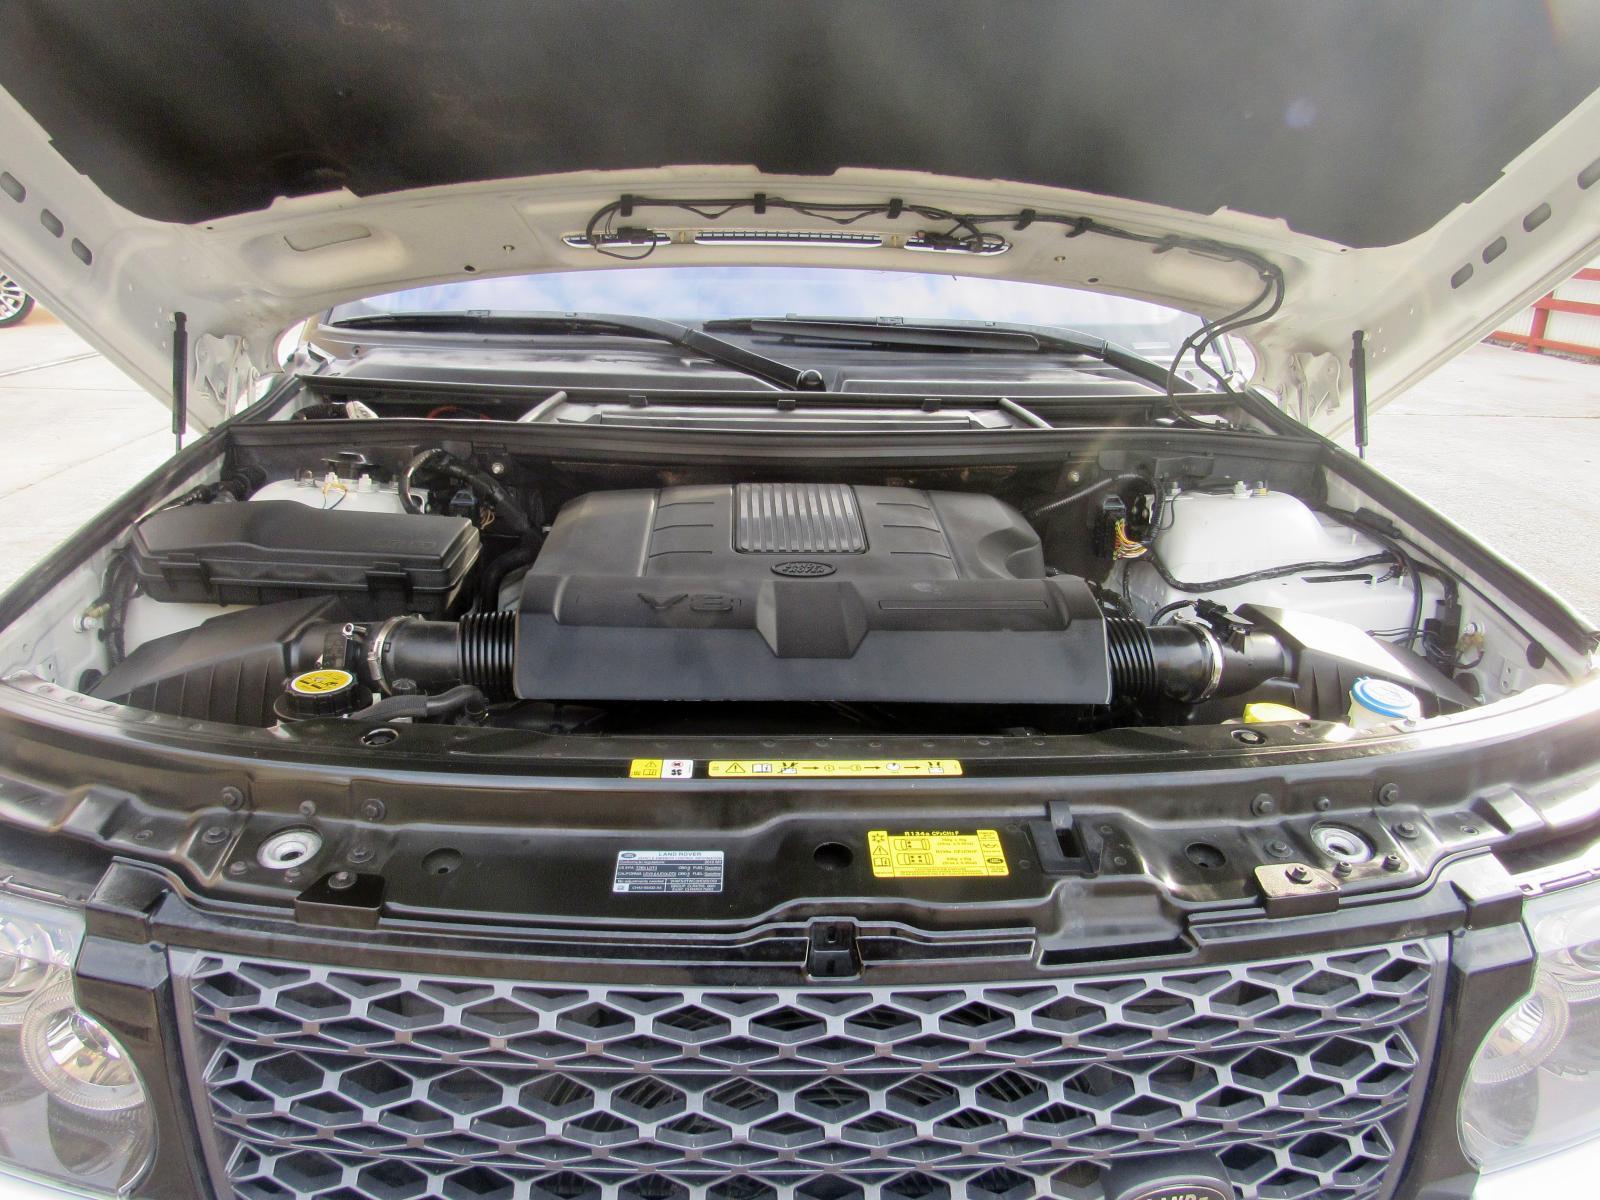 SALMF1D42CA360929 - 2012 Land Rover Range Rove 5.0L inside view